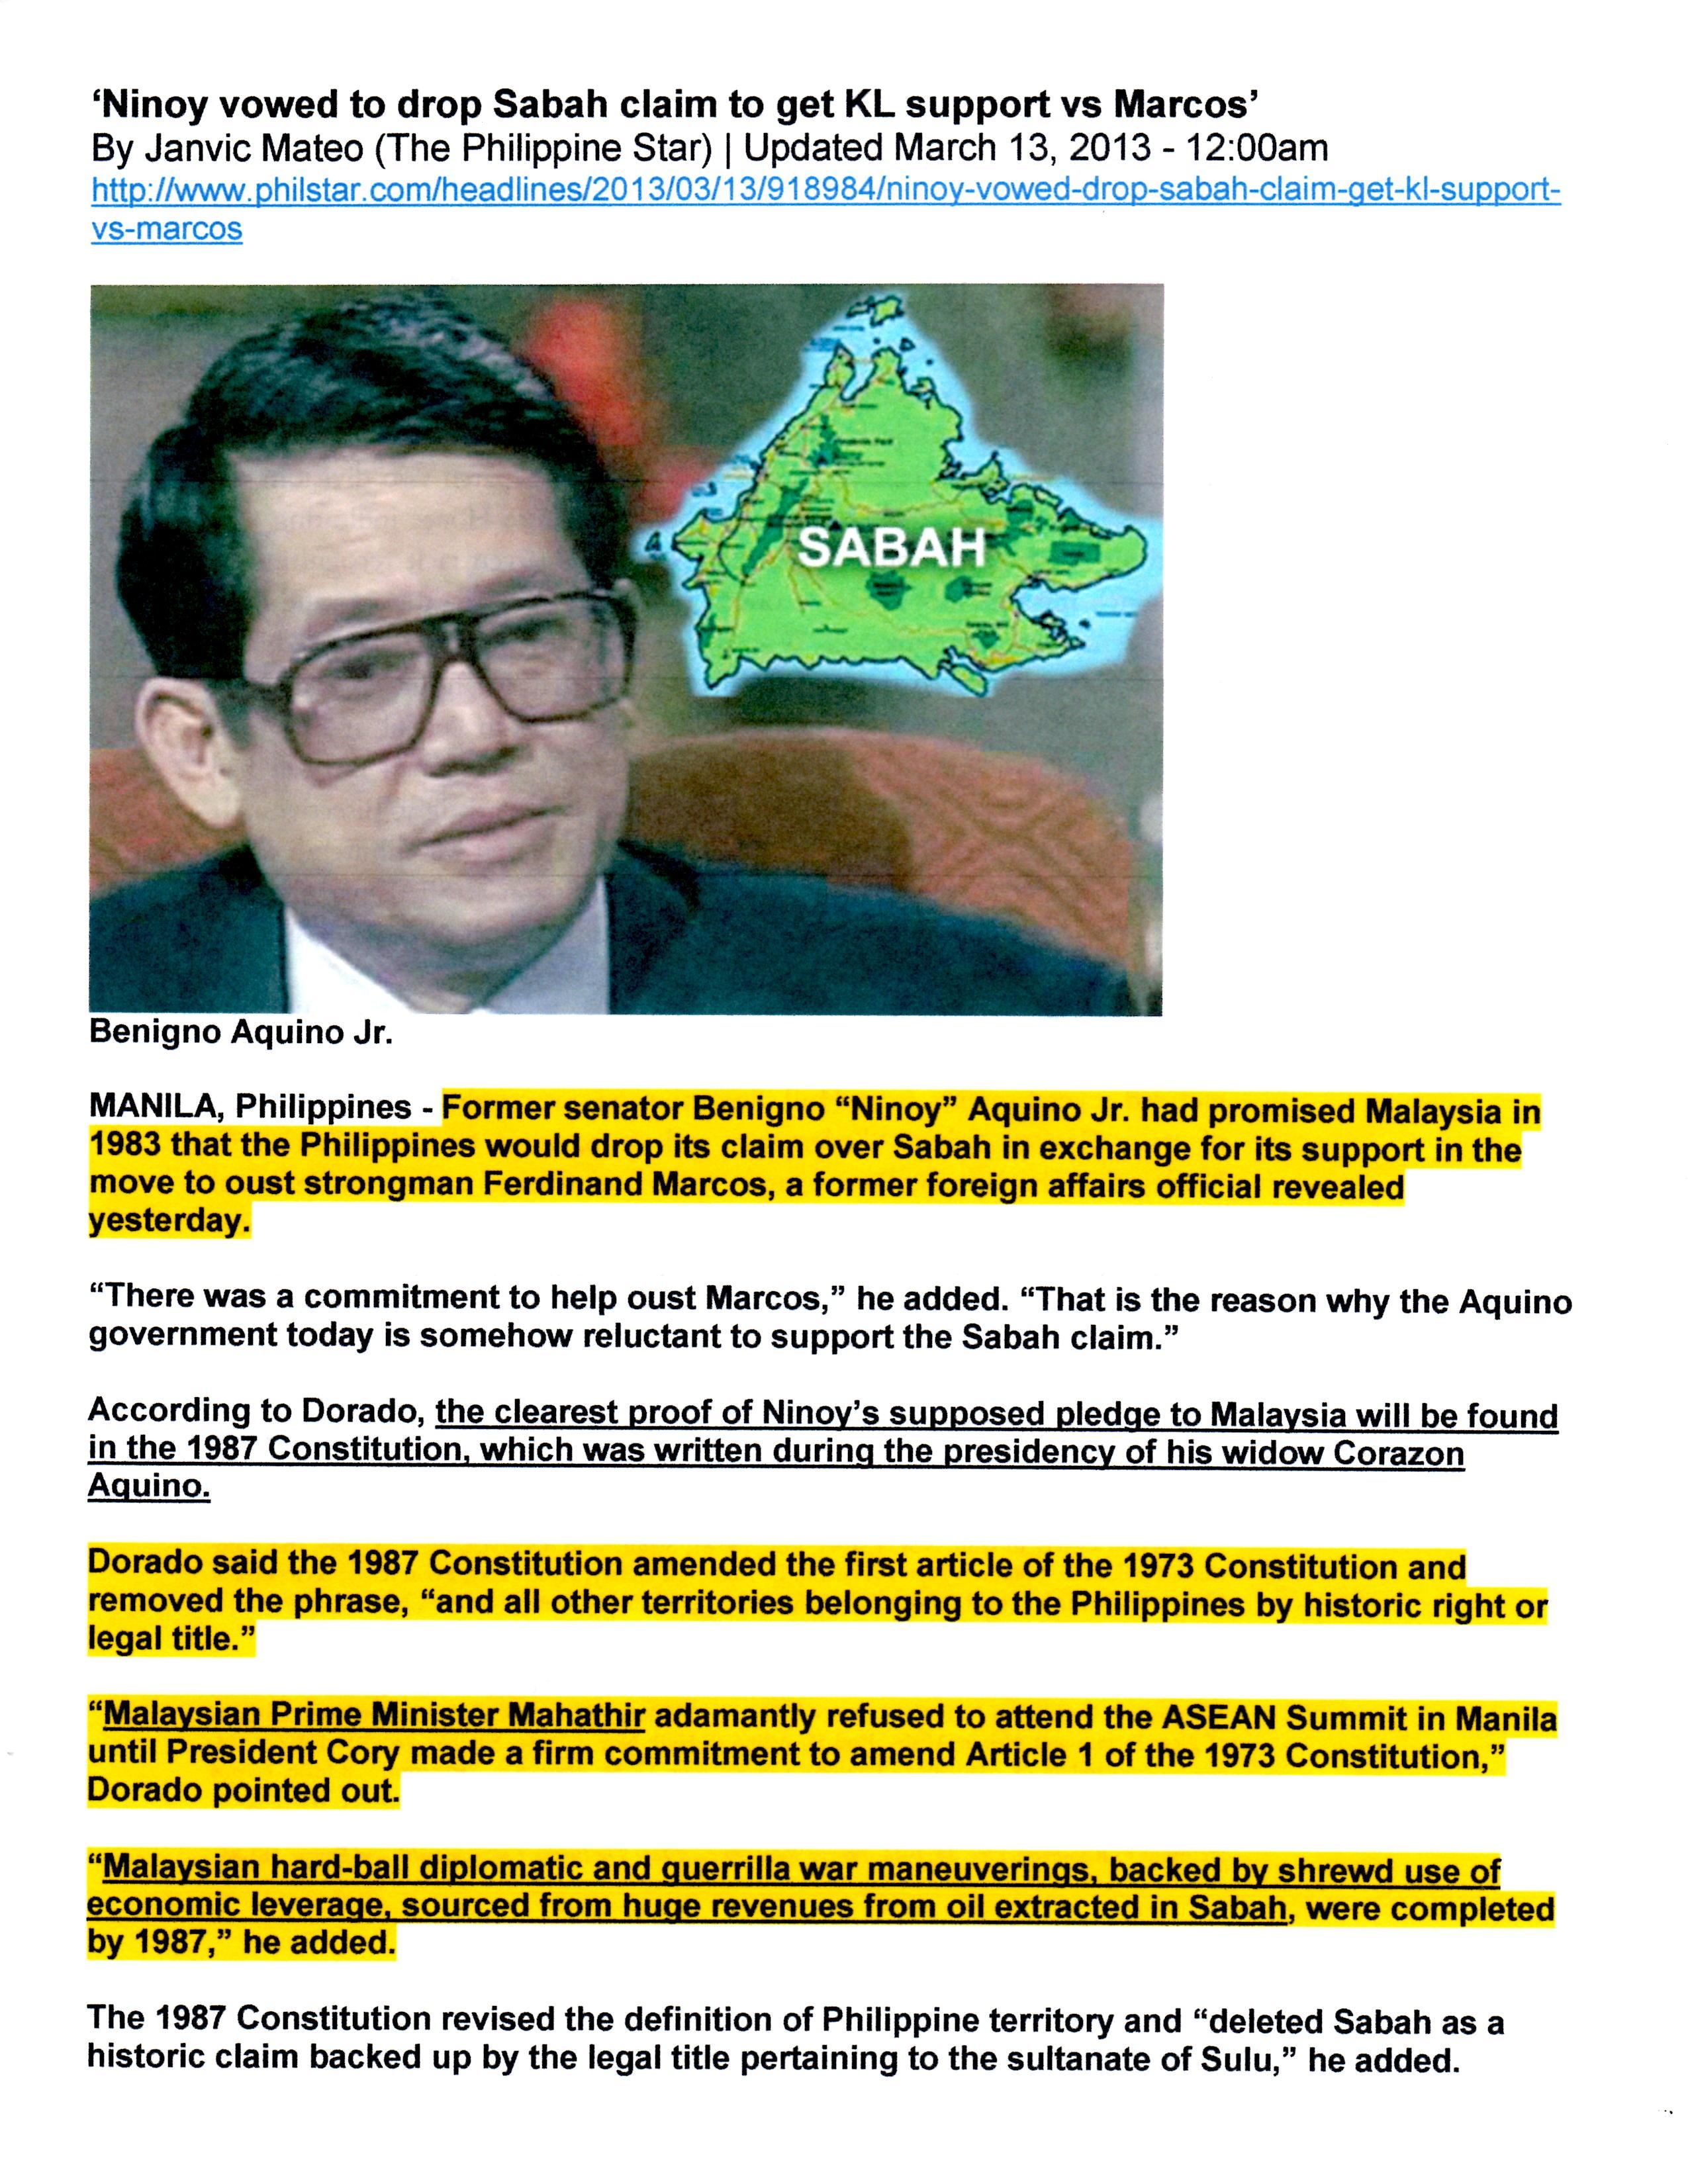 Ninoy Aquino II Betrays Sultan of Sulu